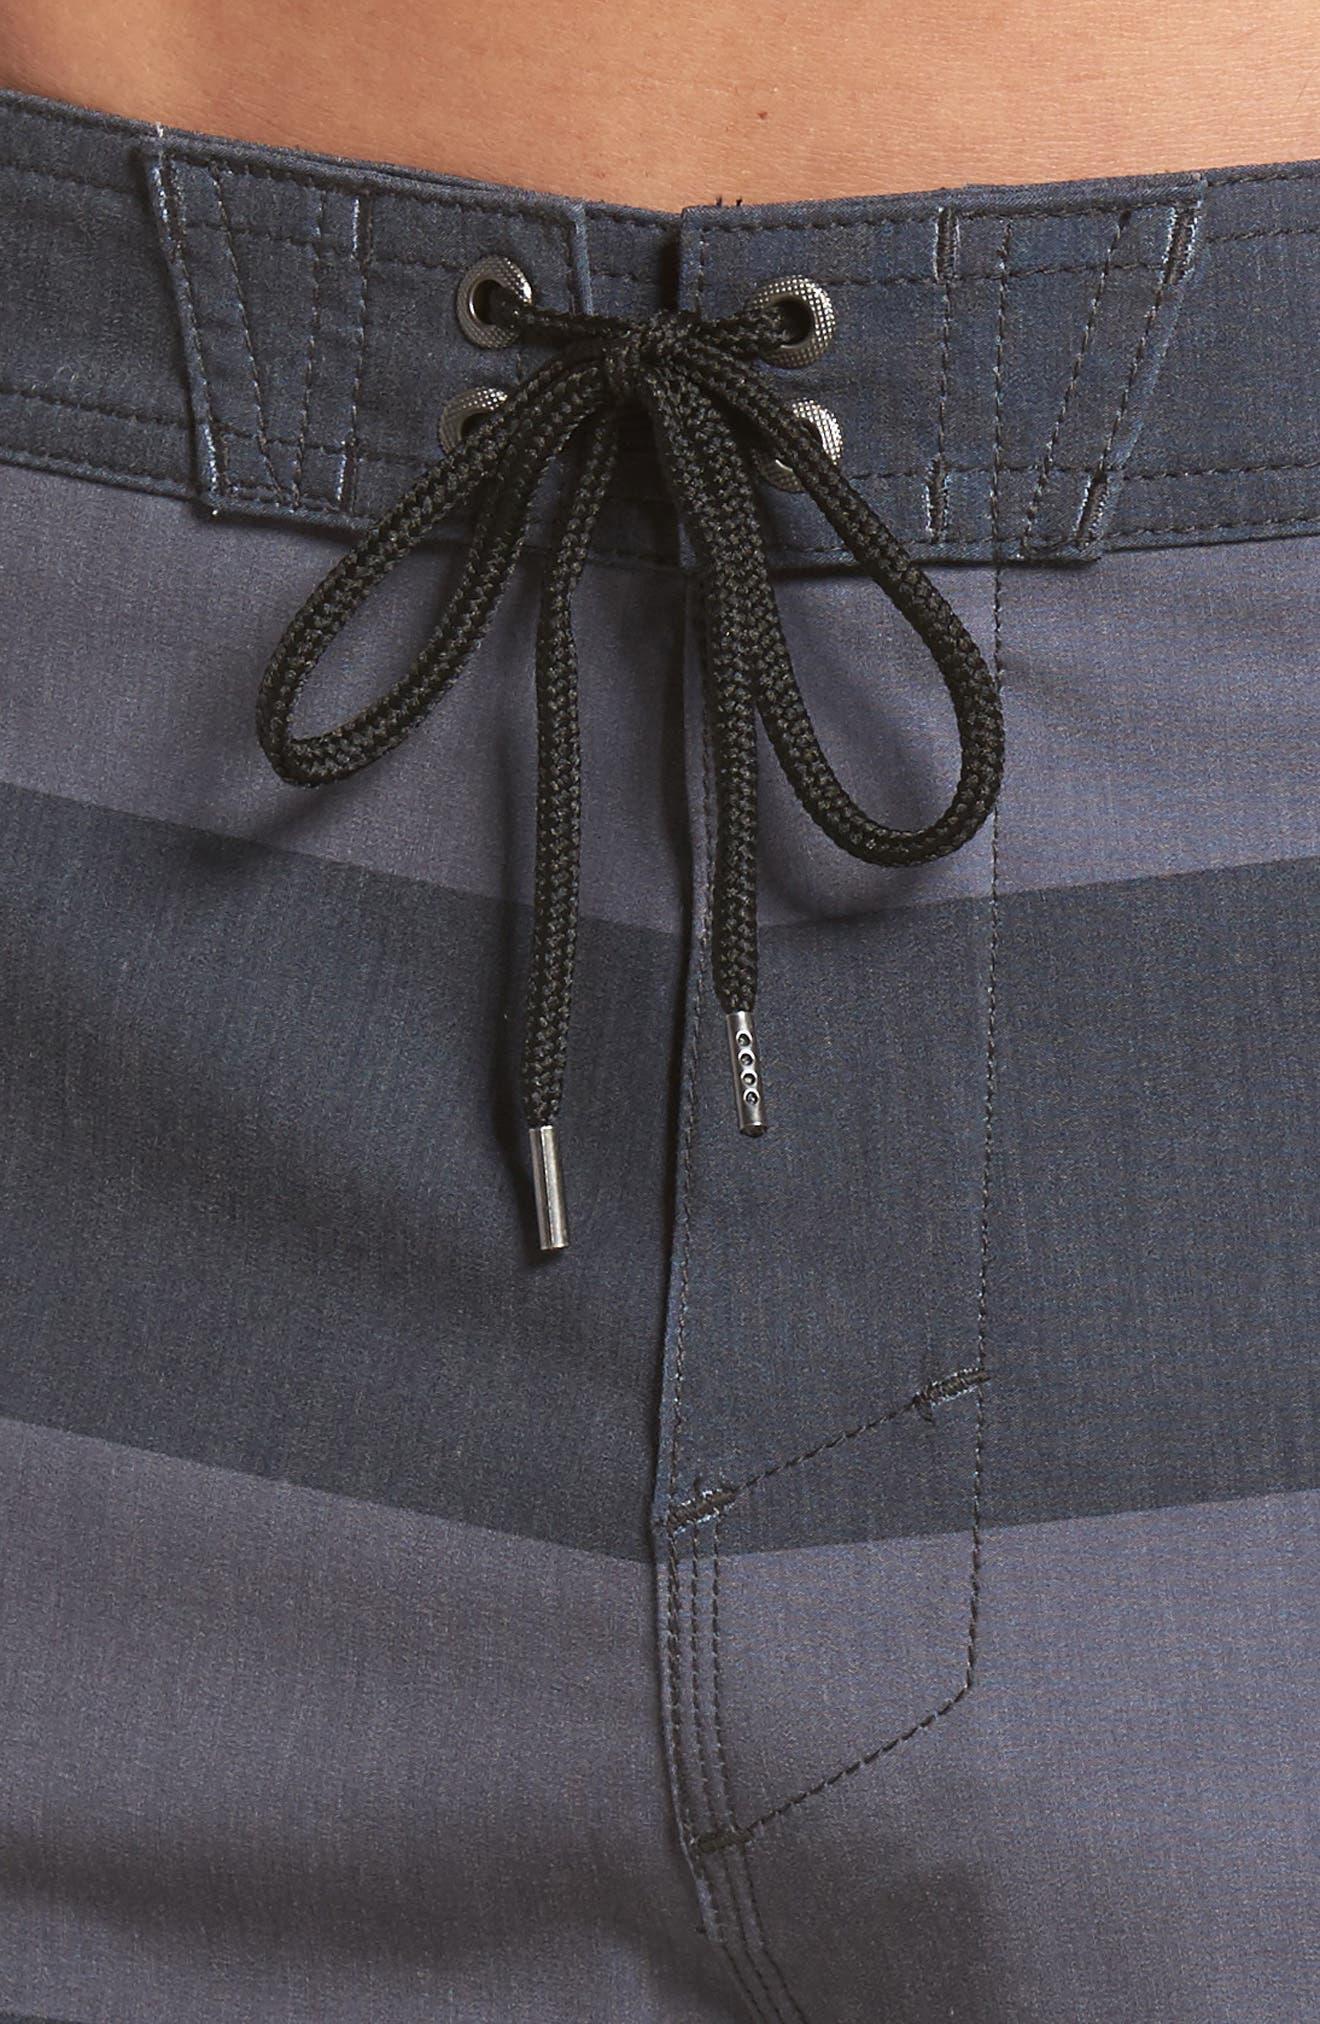 Homage Board Shorts,                             Alternate thumbnail 4, color,                             Black